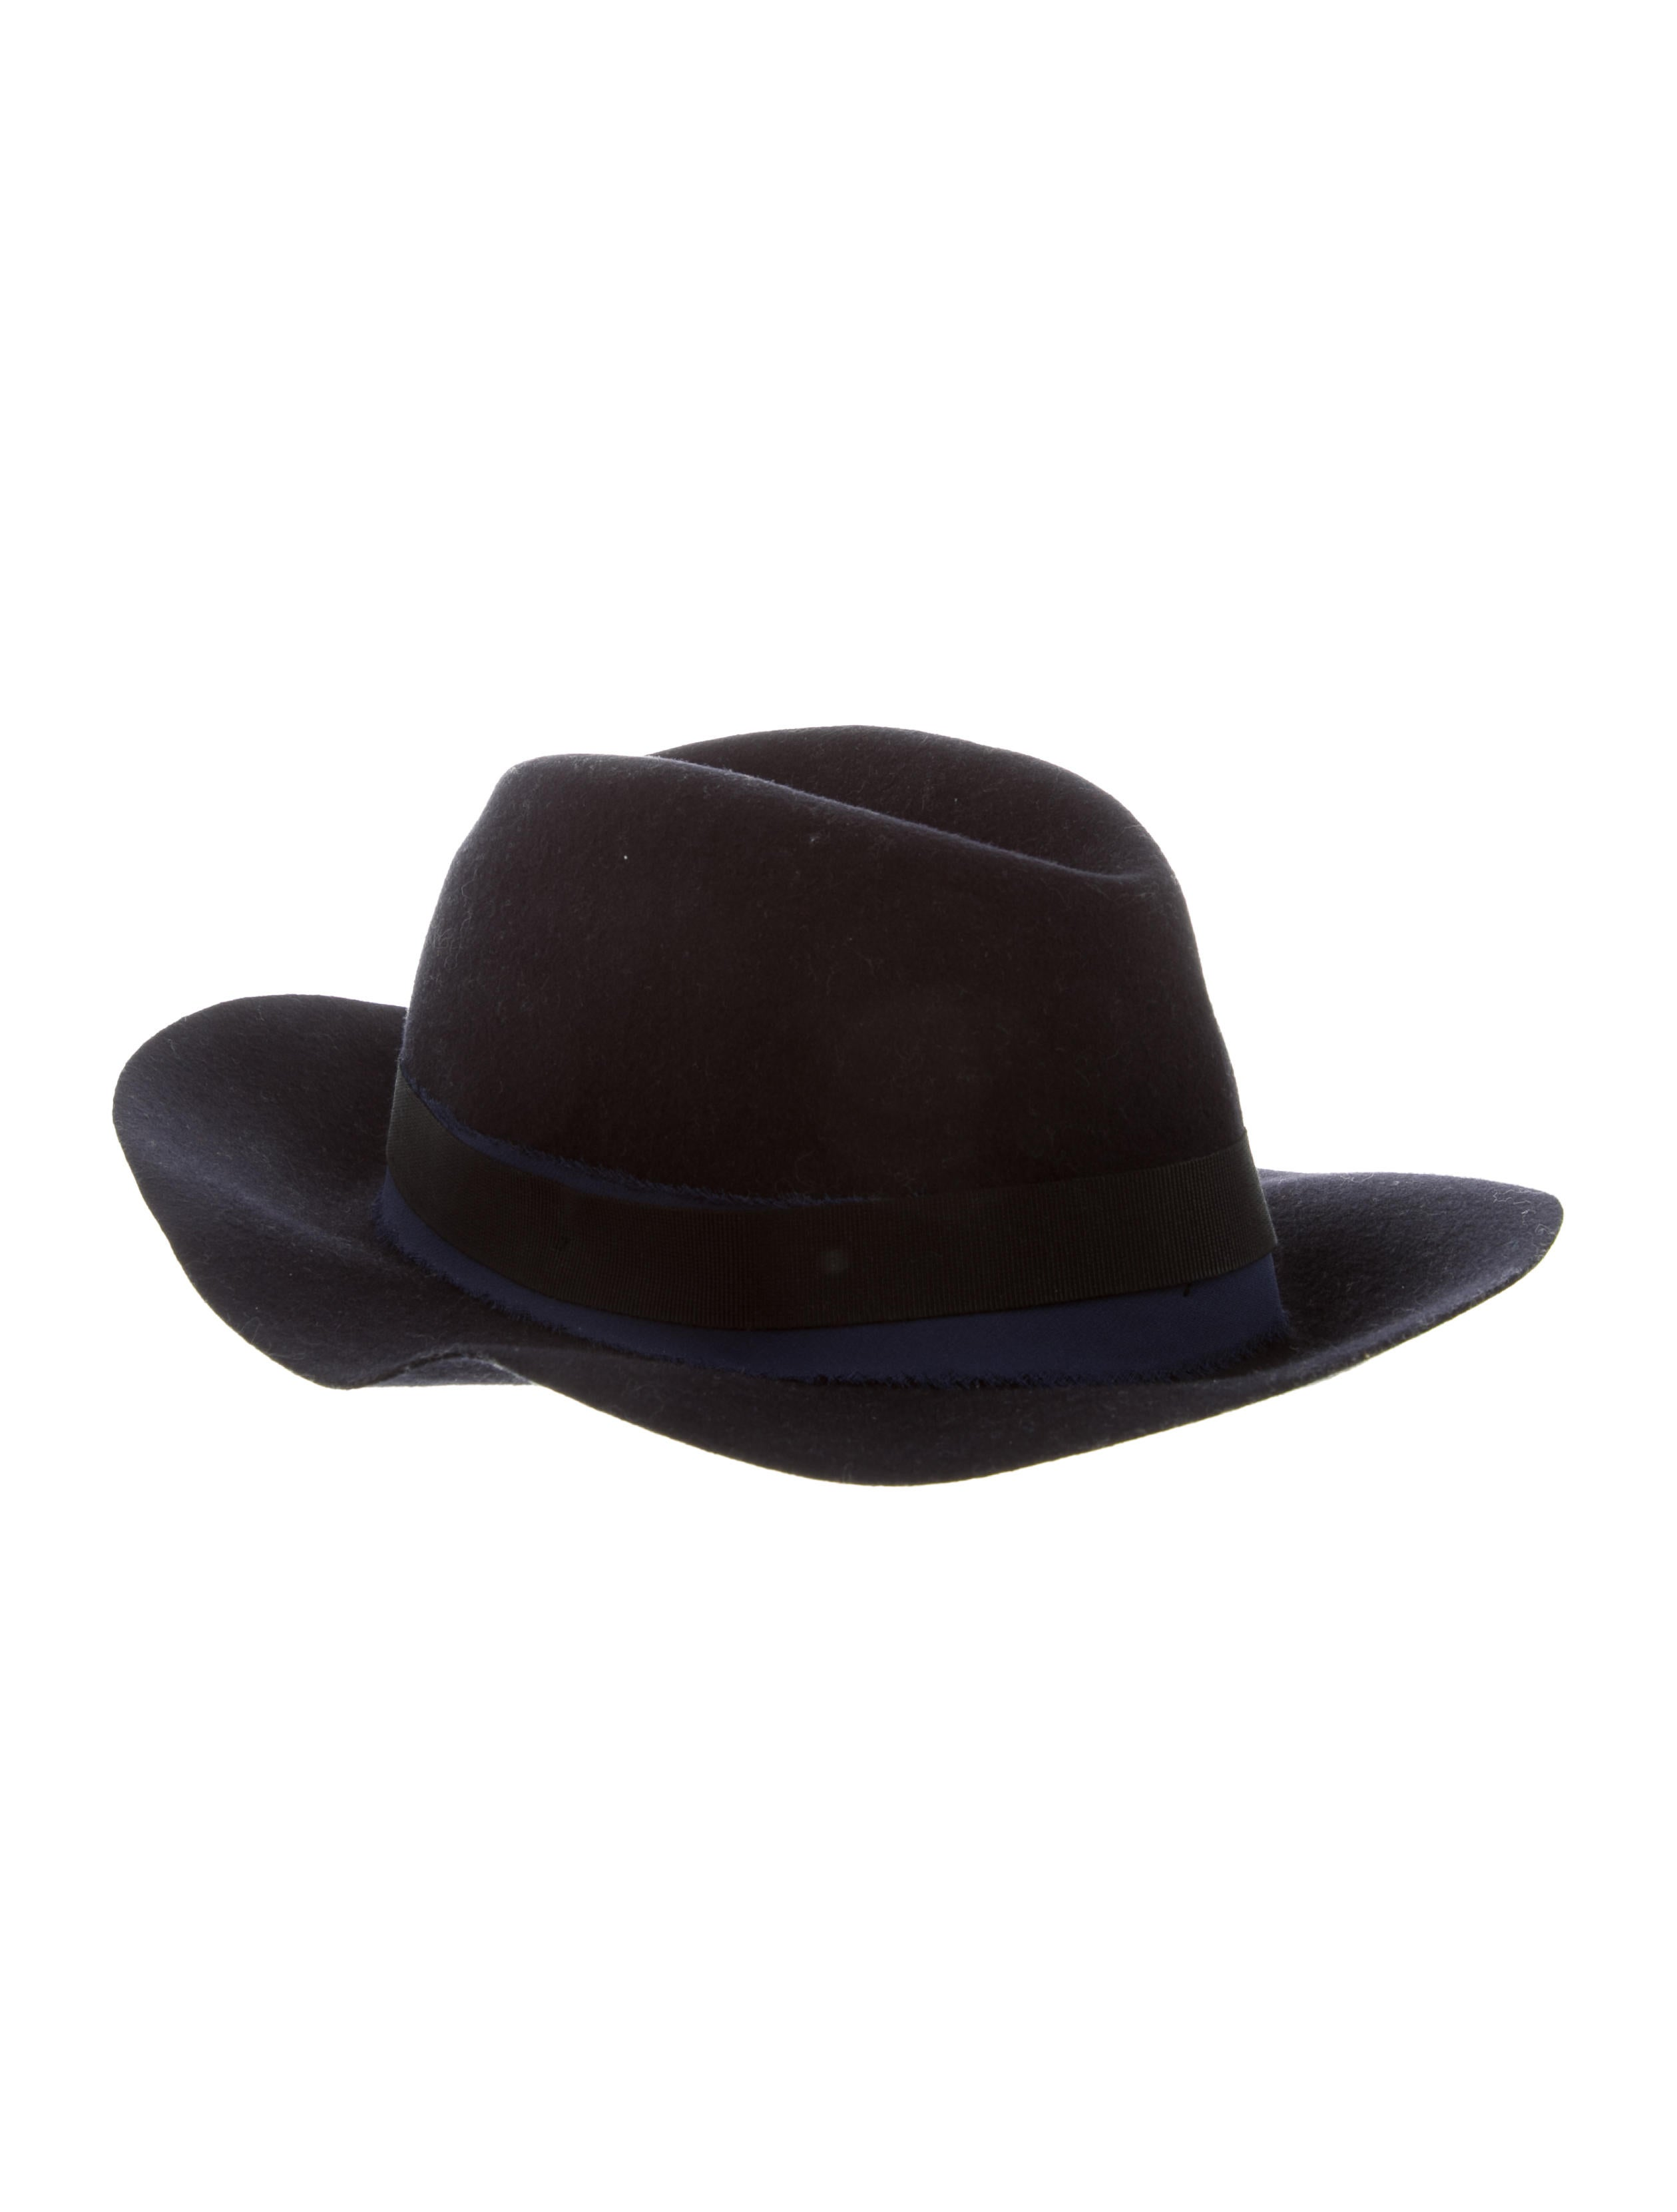 Accesorios - Sombreros Máje qq3EcwiQqP